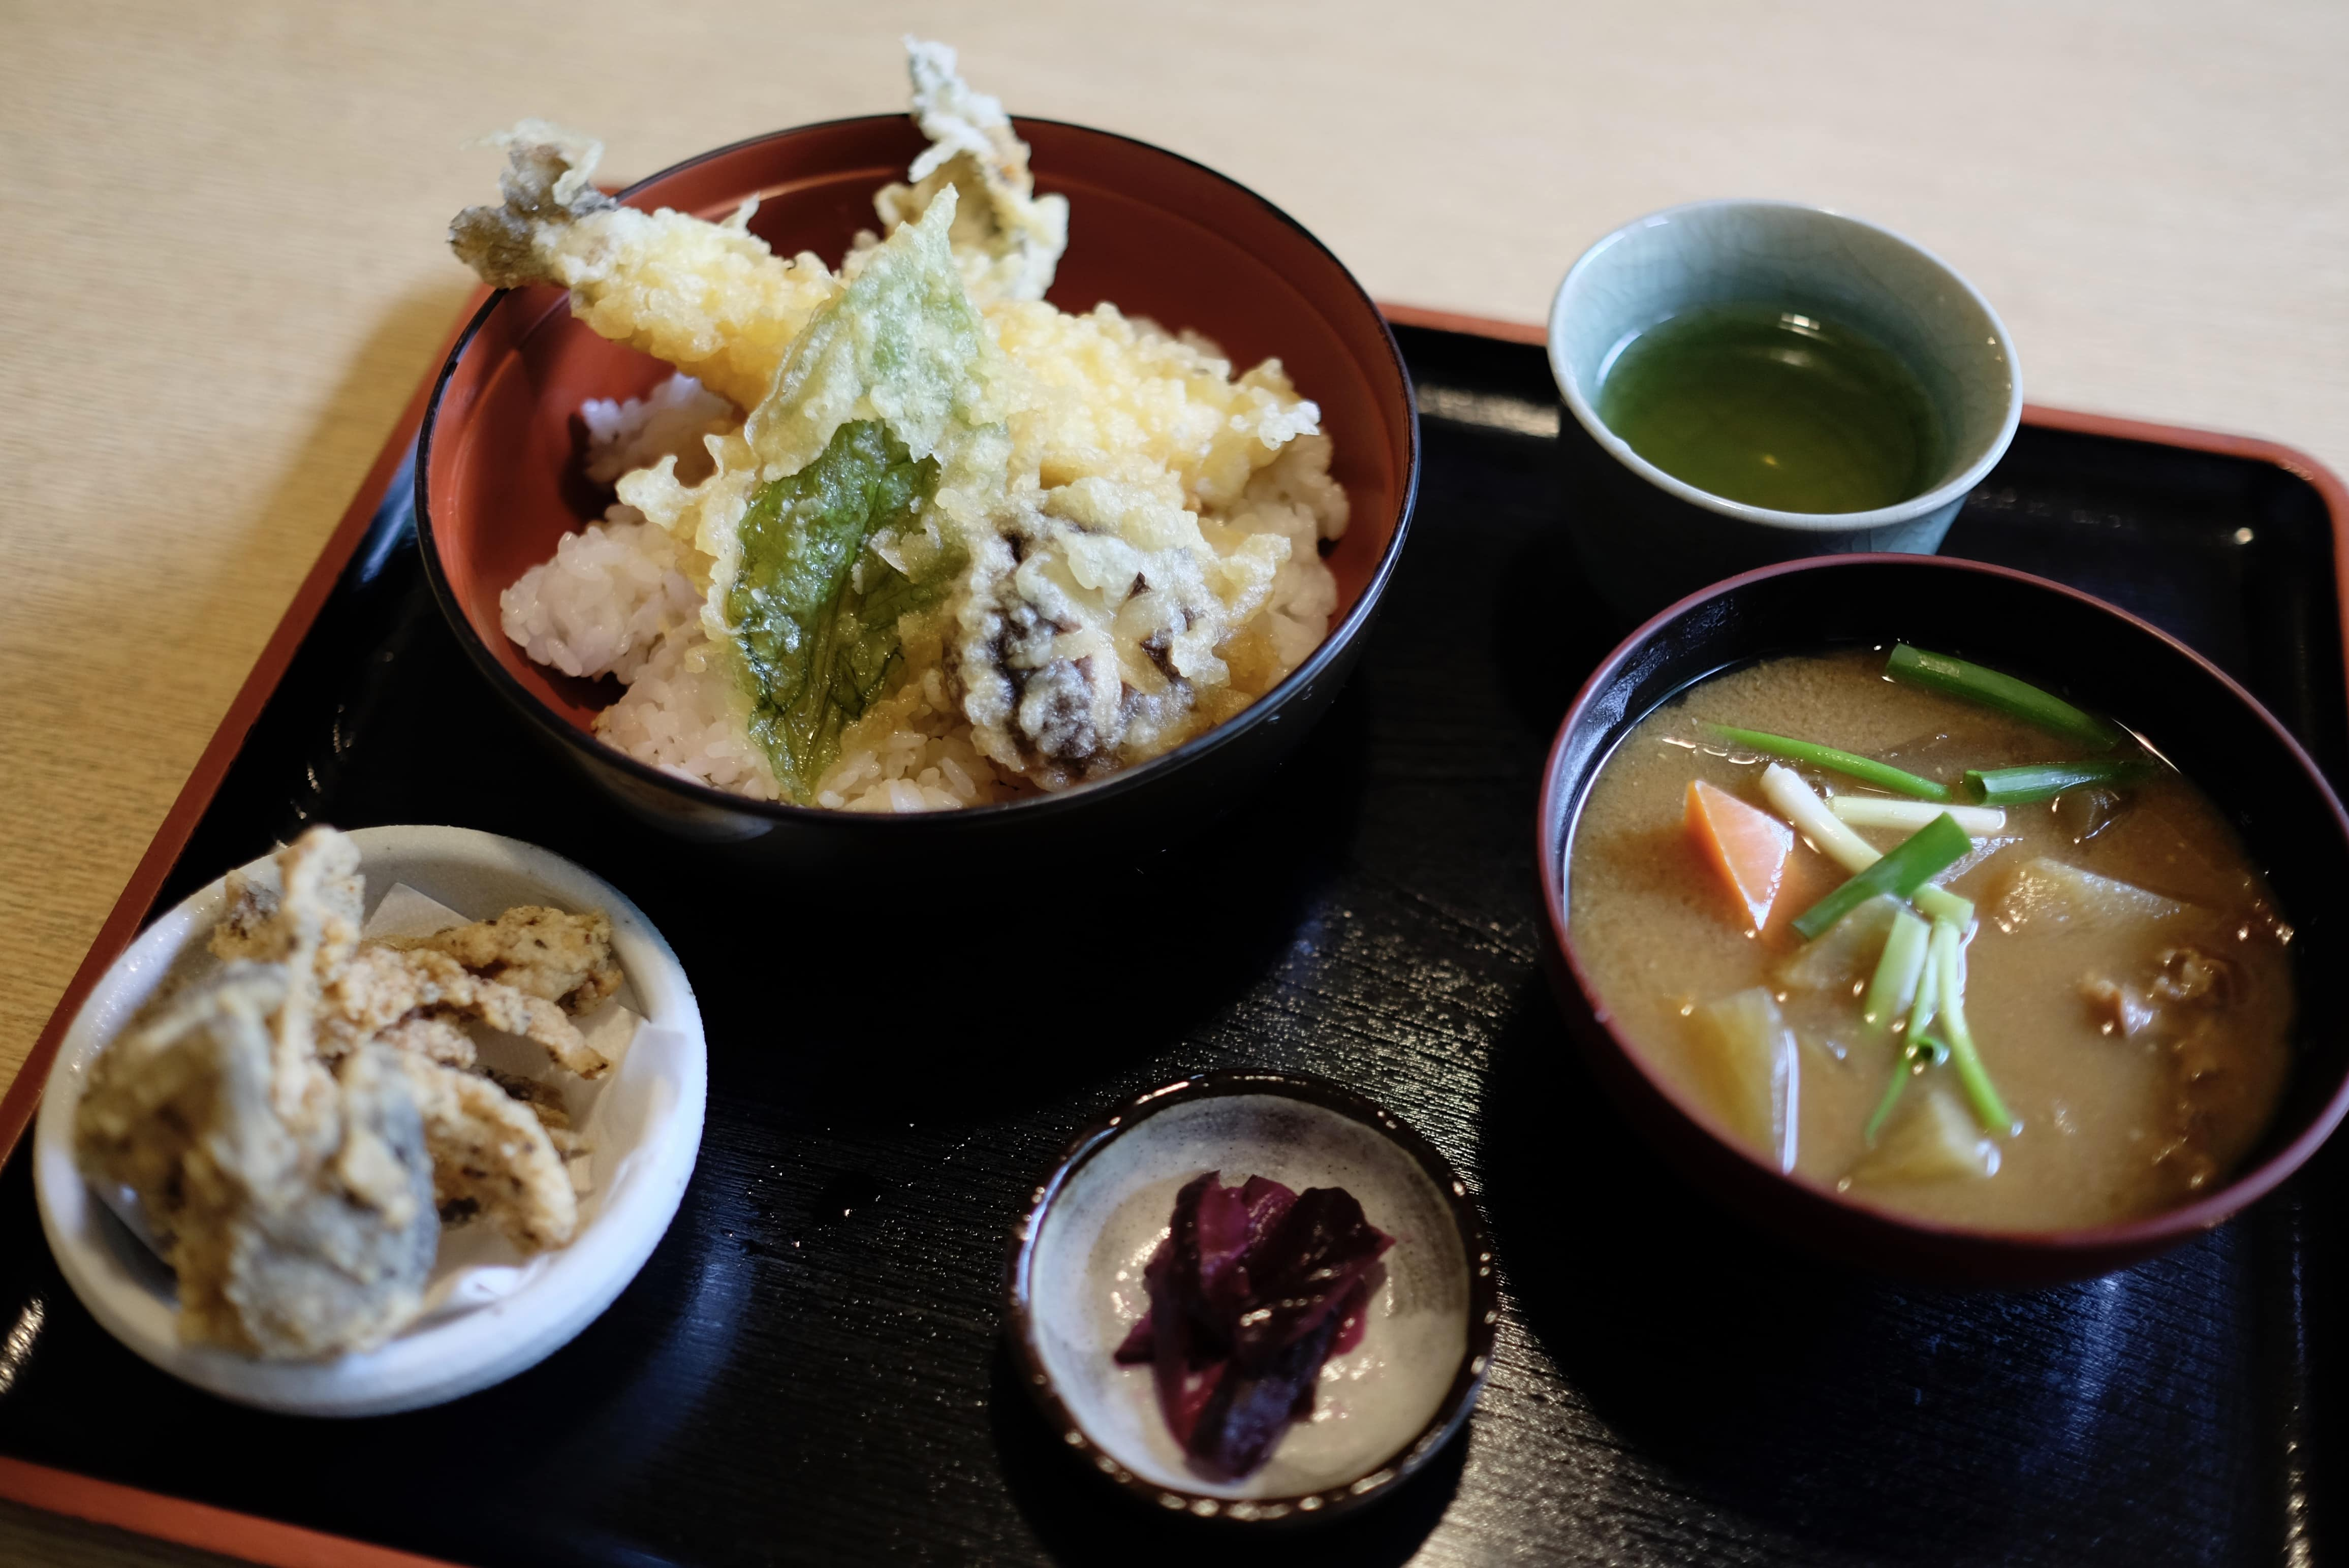 Lunch at Shikibidani Onsen (四季美谷温泉)